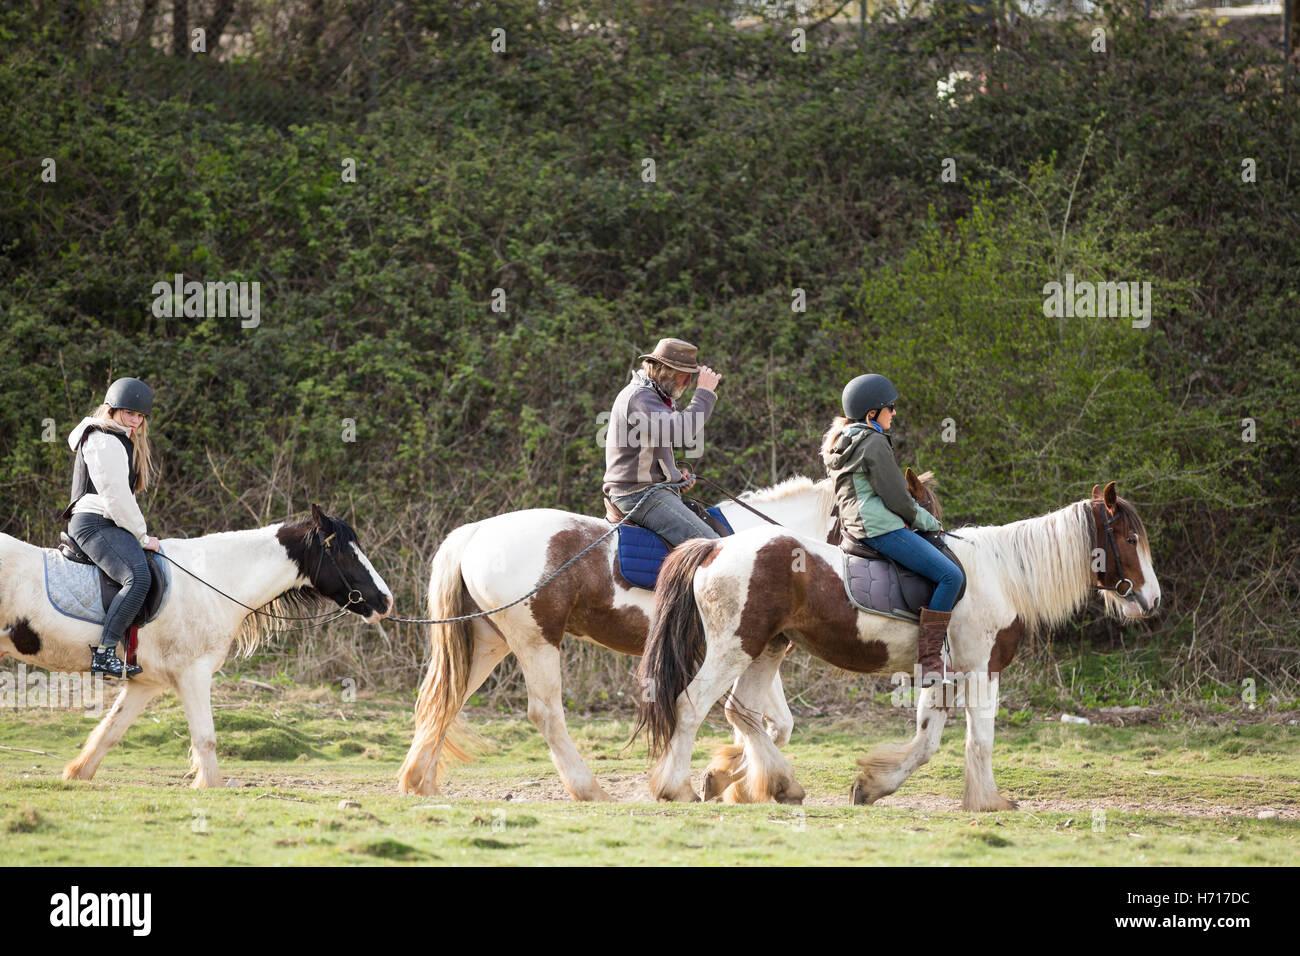 children pony trekking with adult leader - Stock Image